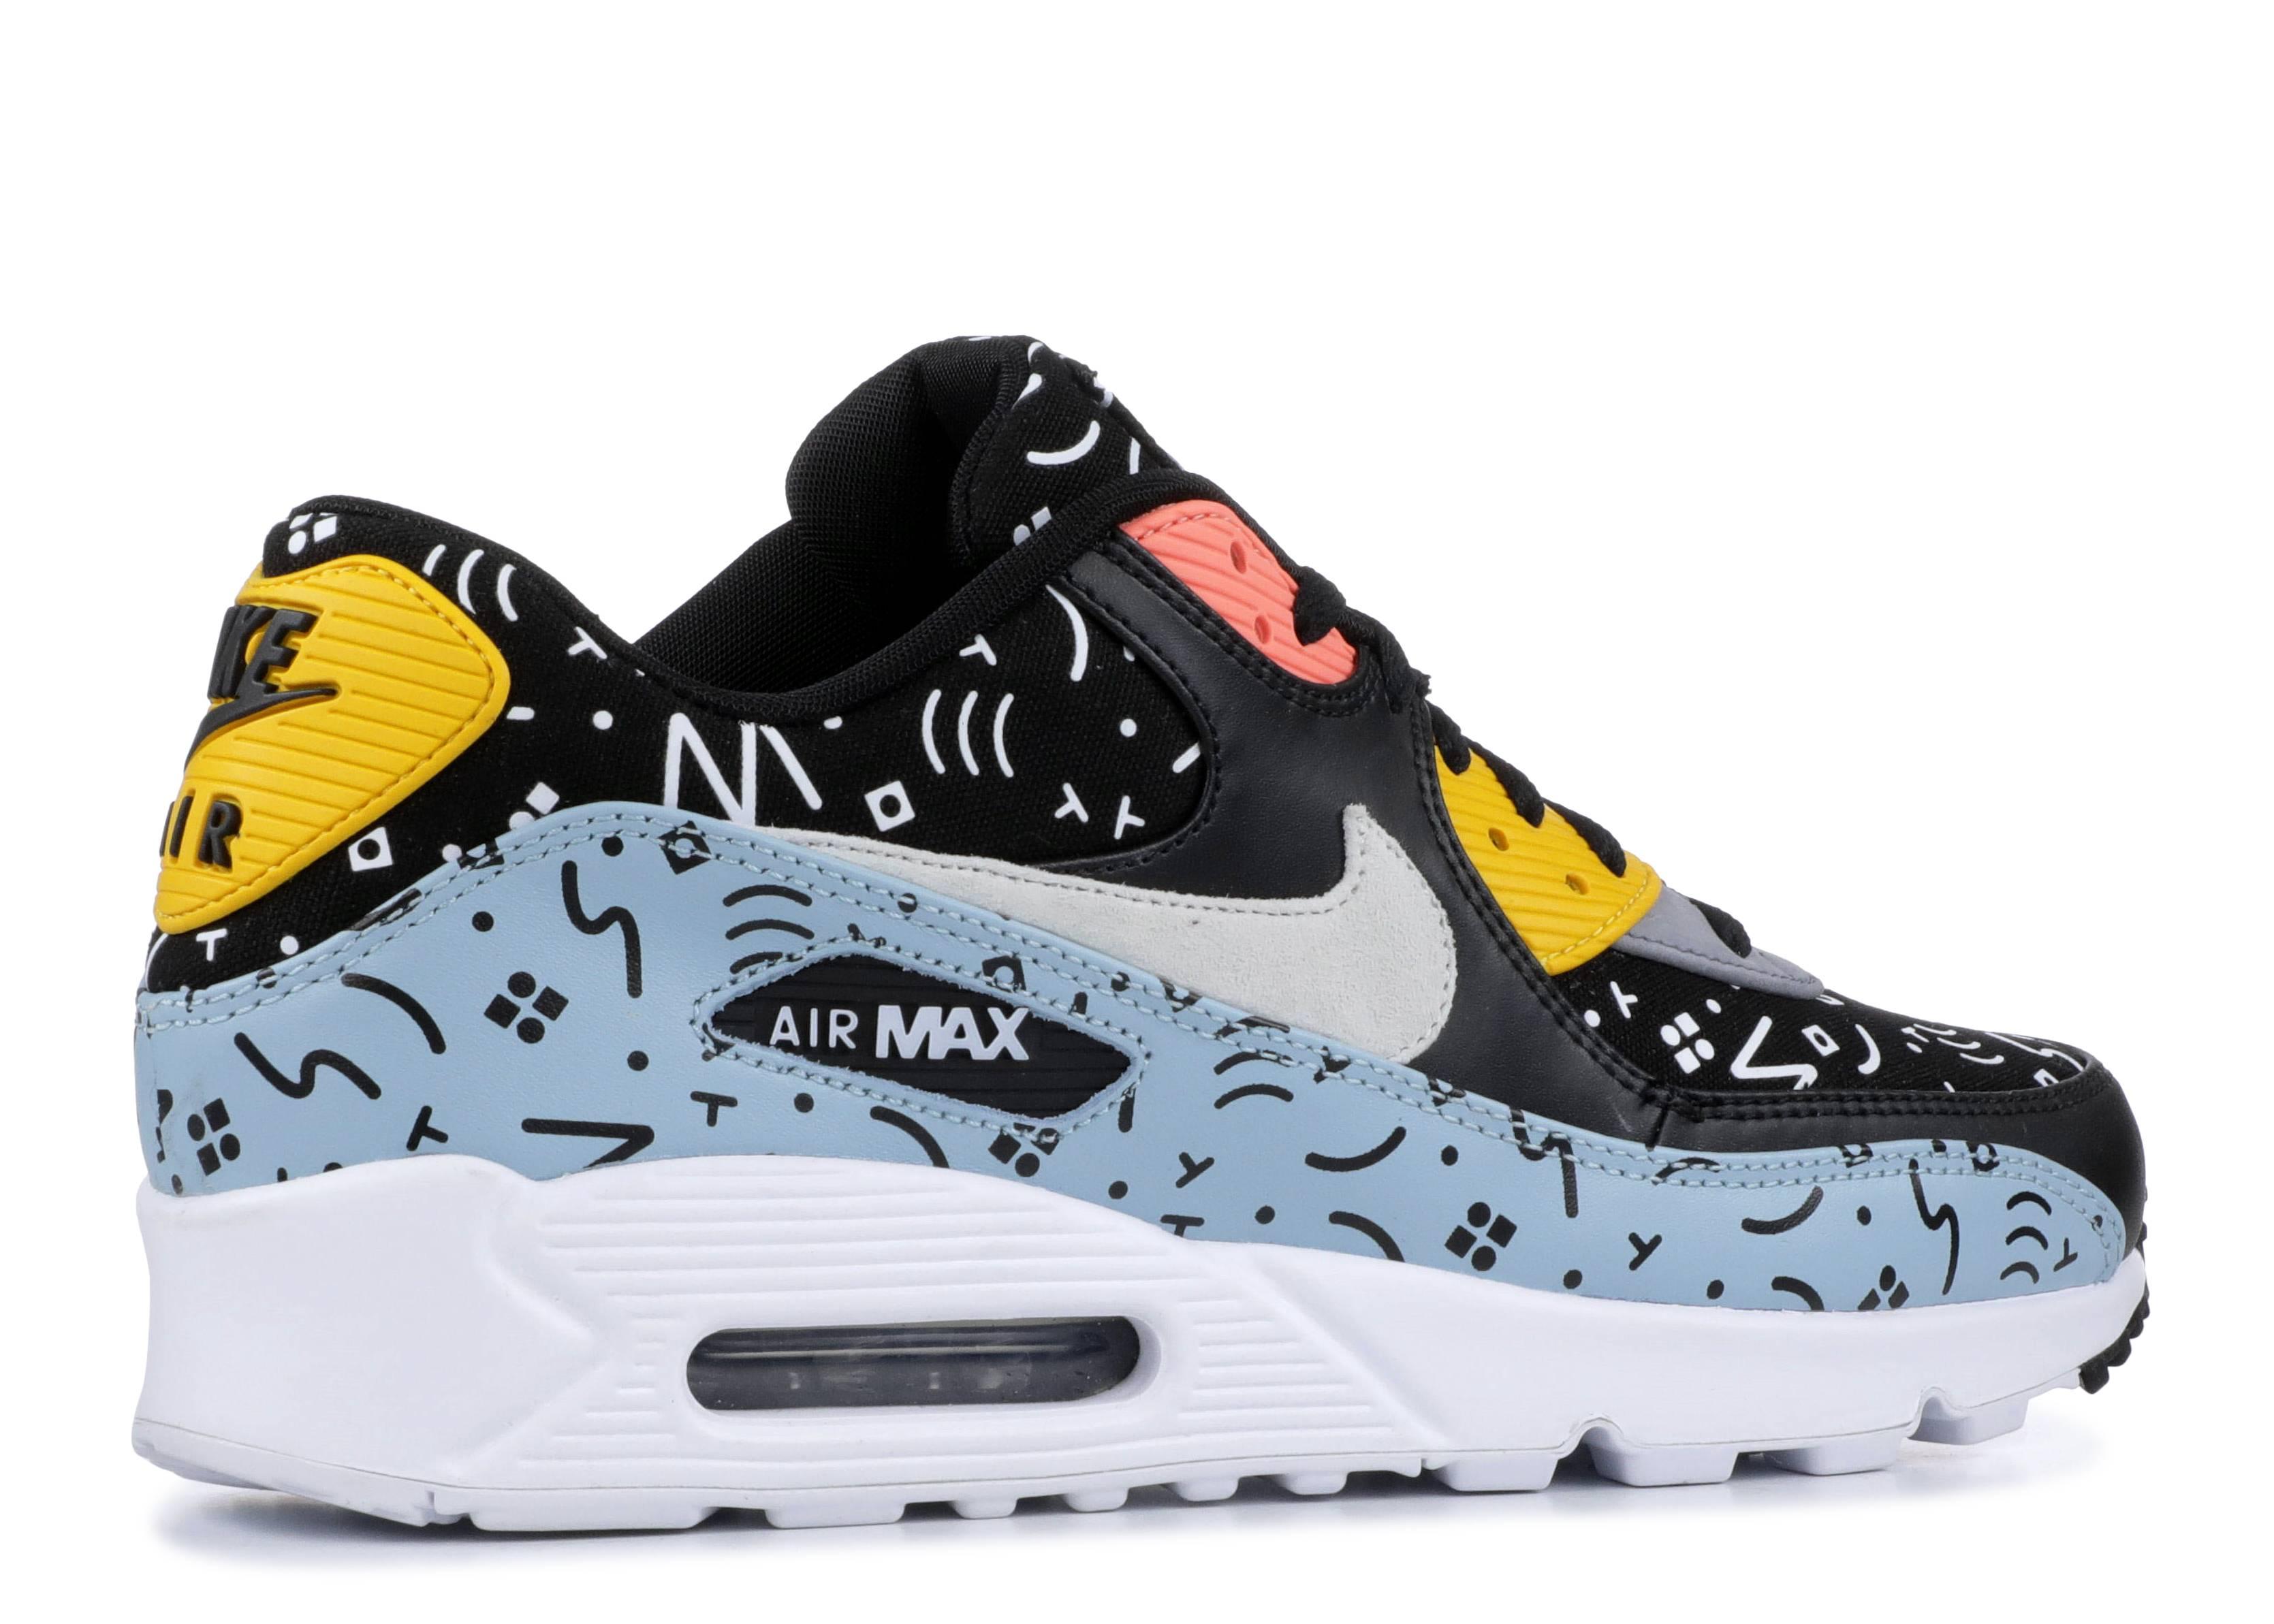 d2678d8852 Nike Air Max 90 Premium